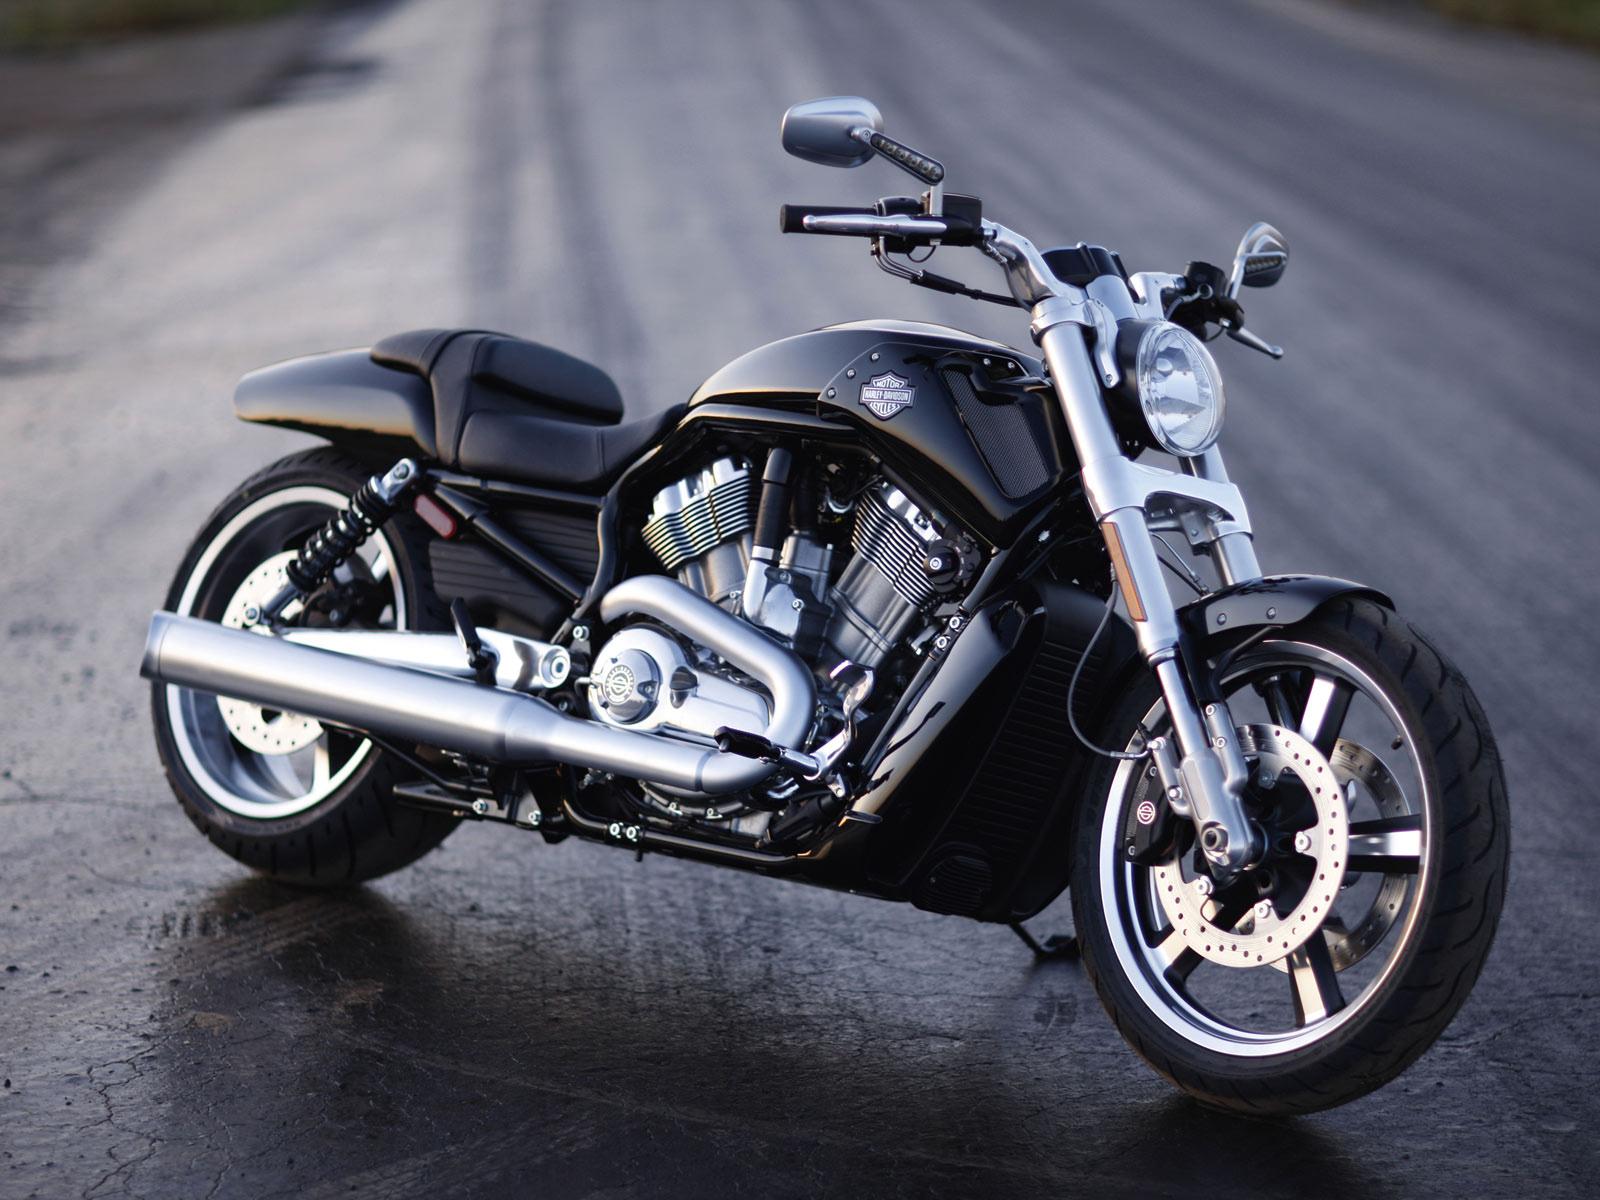 Harley Davidson VRSCF